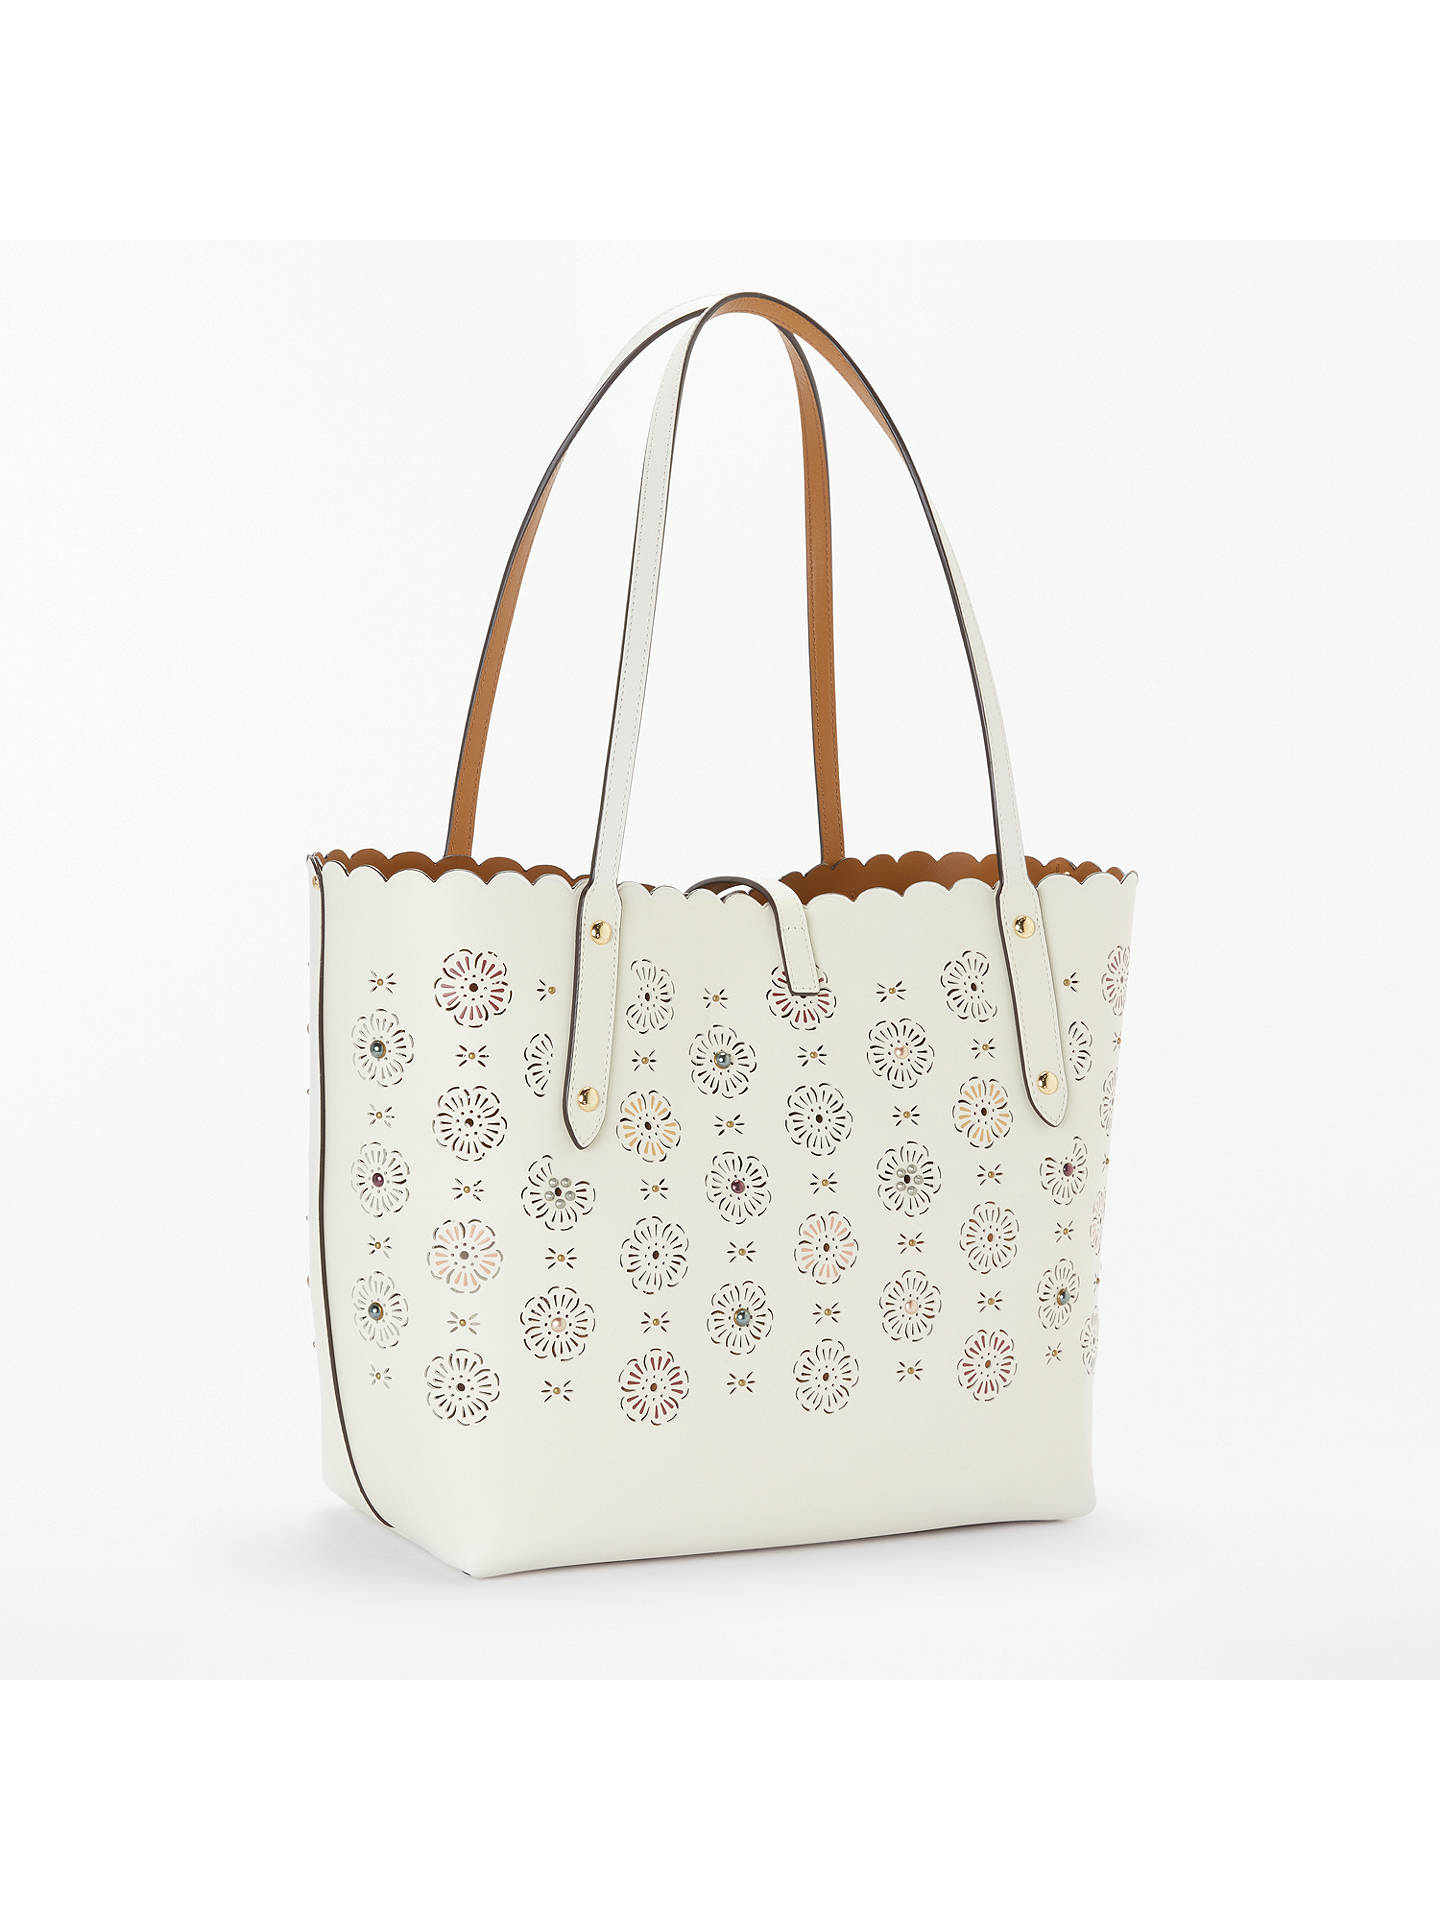 19876e2eca ... Buy Coach Market Floral Cut Leather Tote Bag